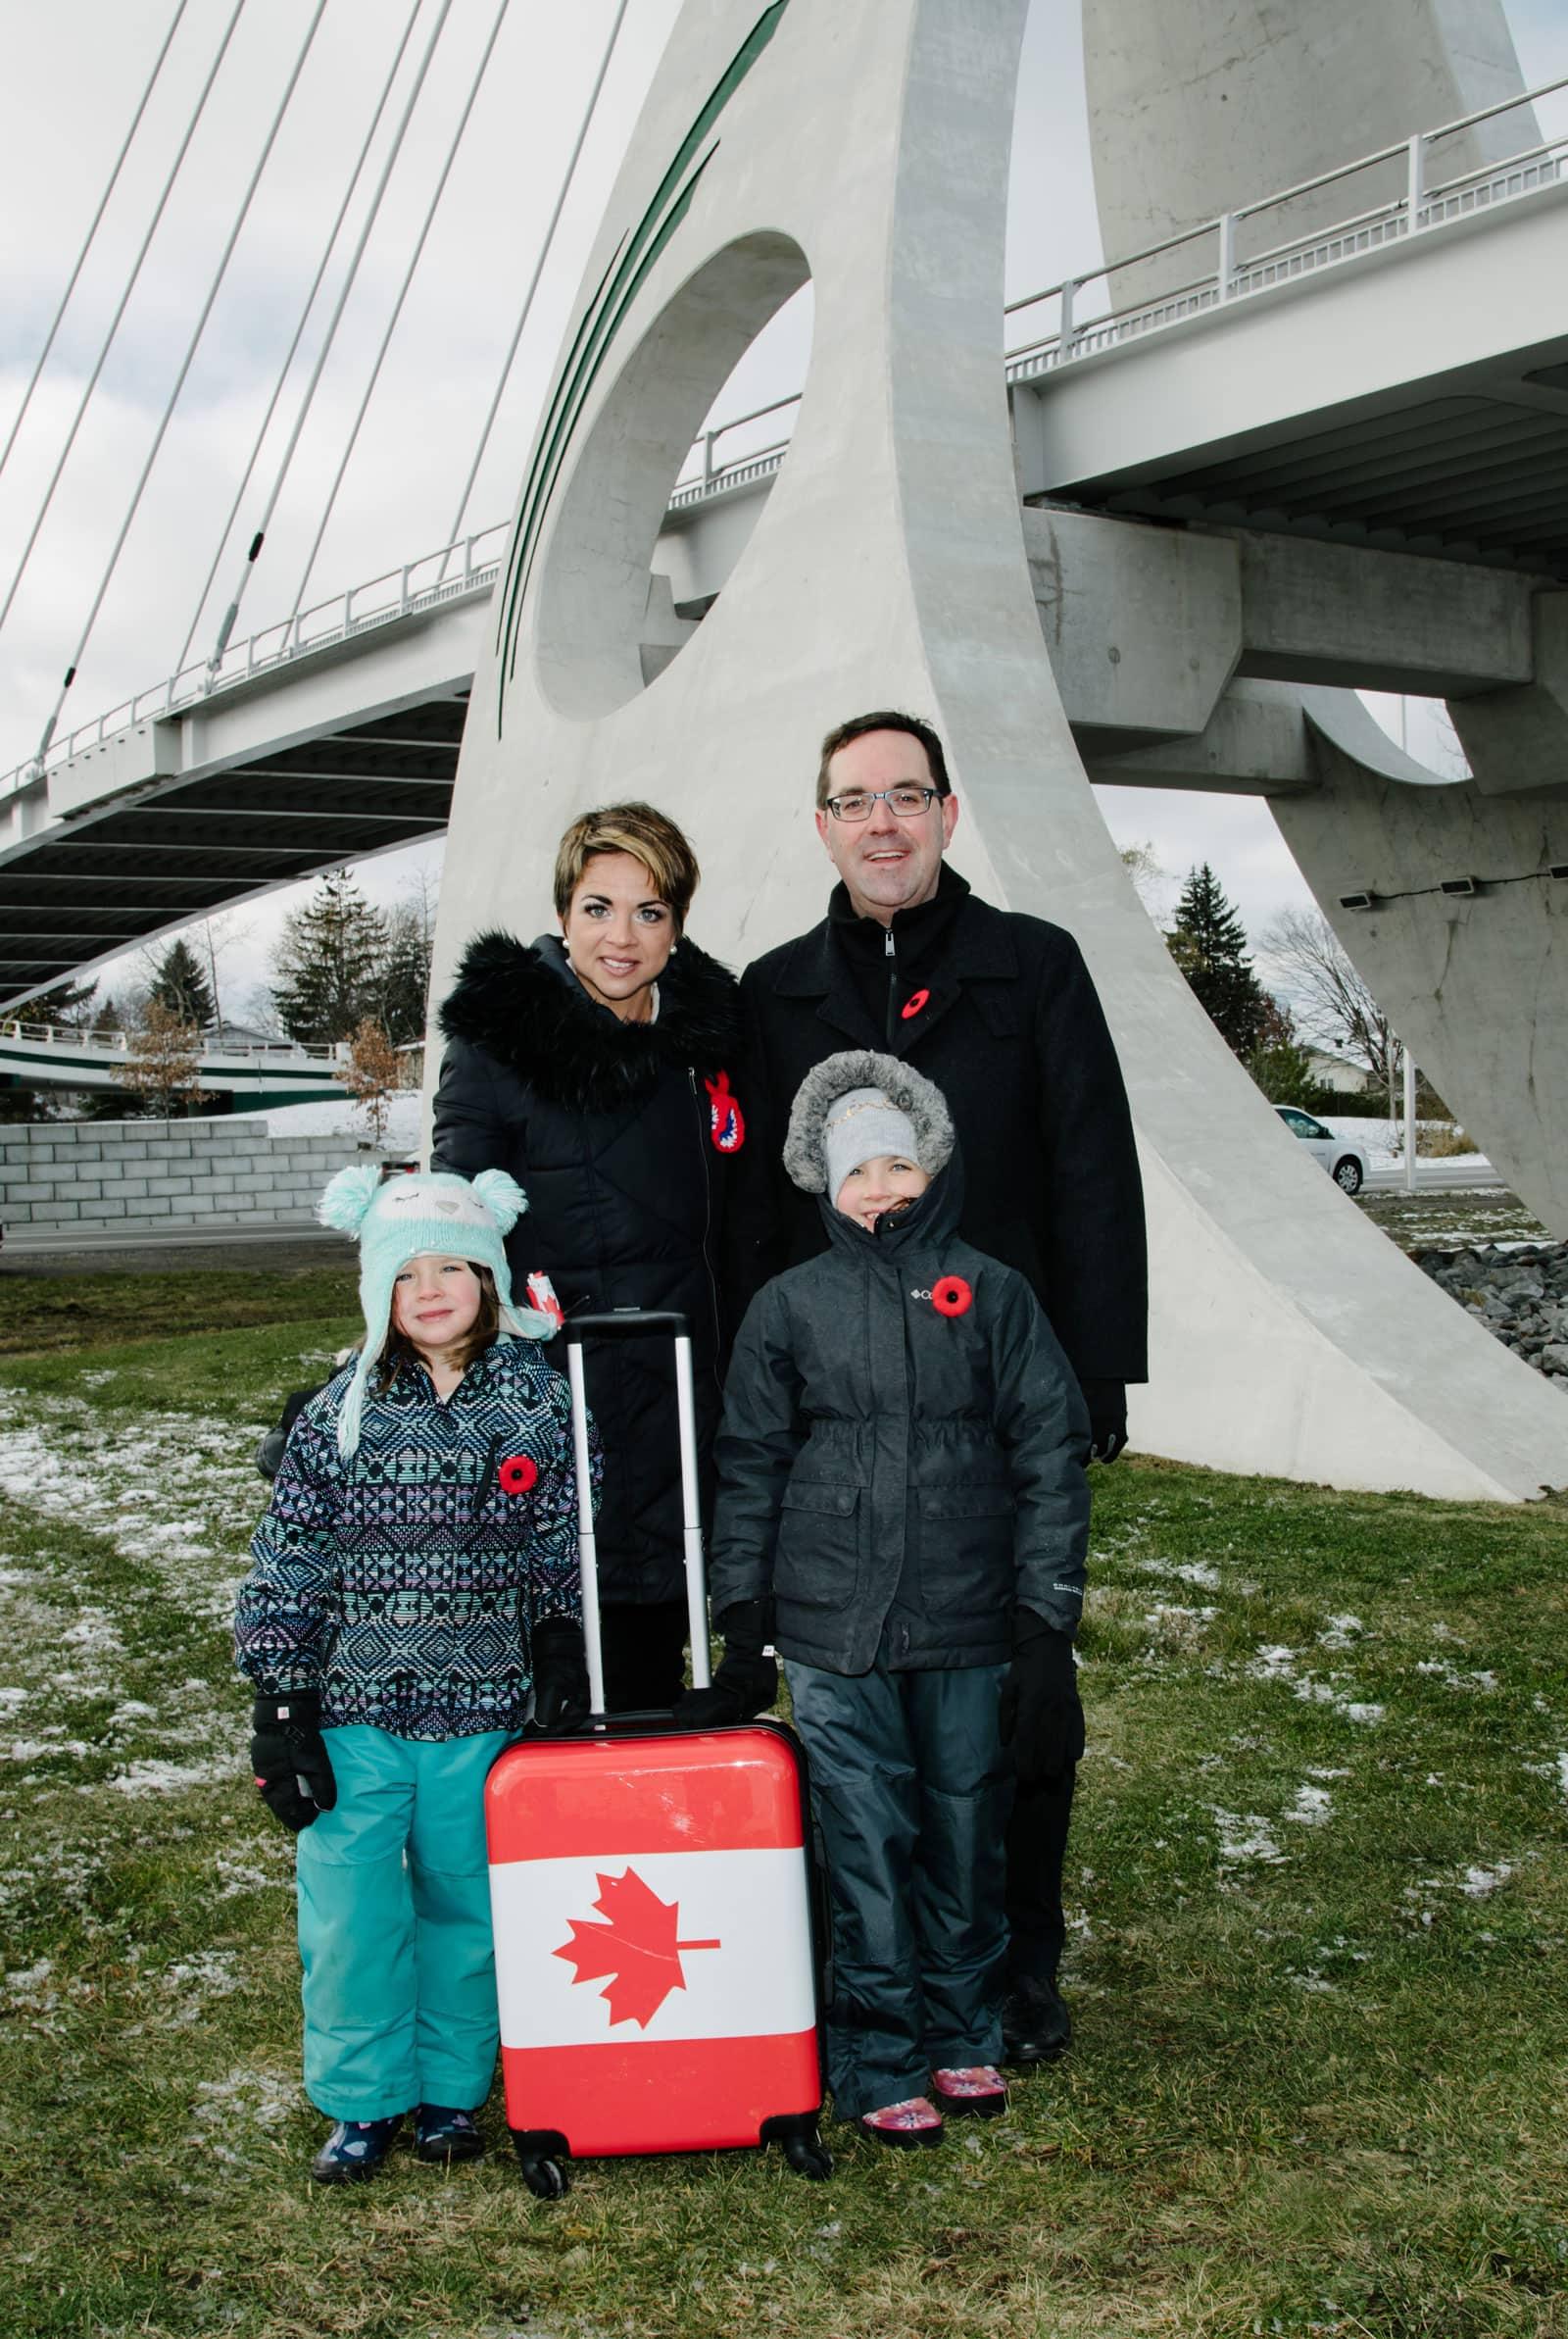 Juno Beach Memorial Bridge - Councillor Glen Gower with Amanda Purdy and Family